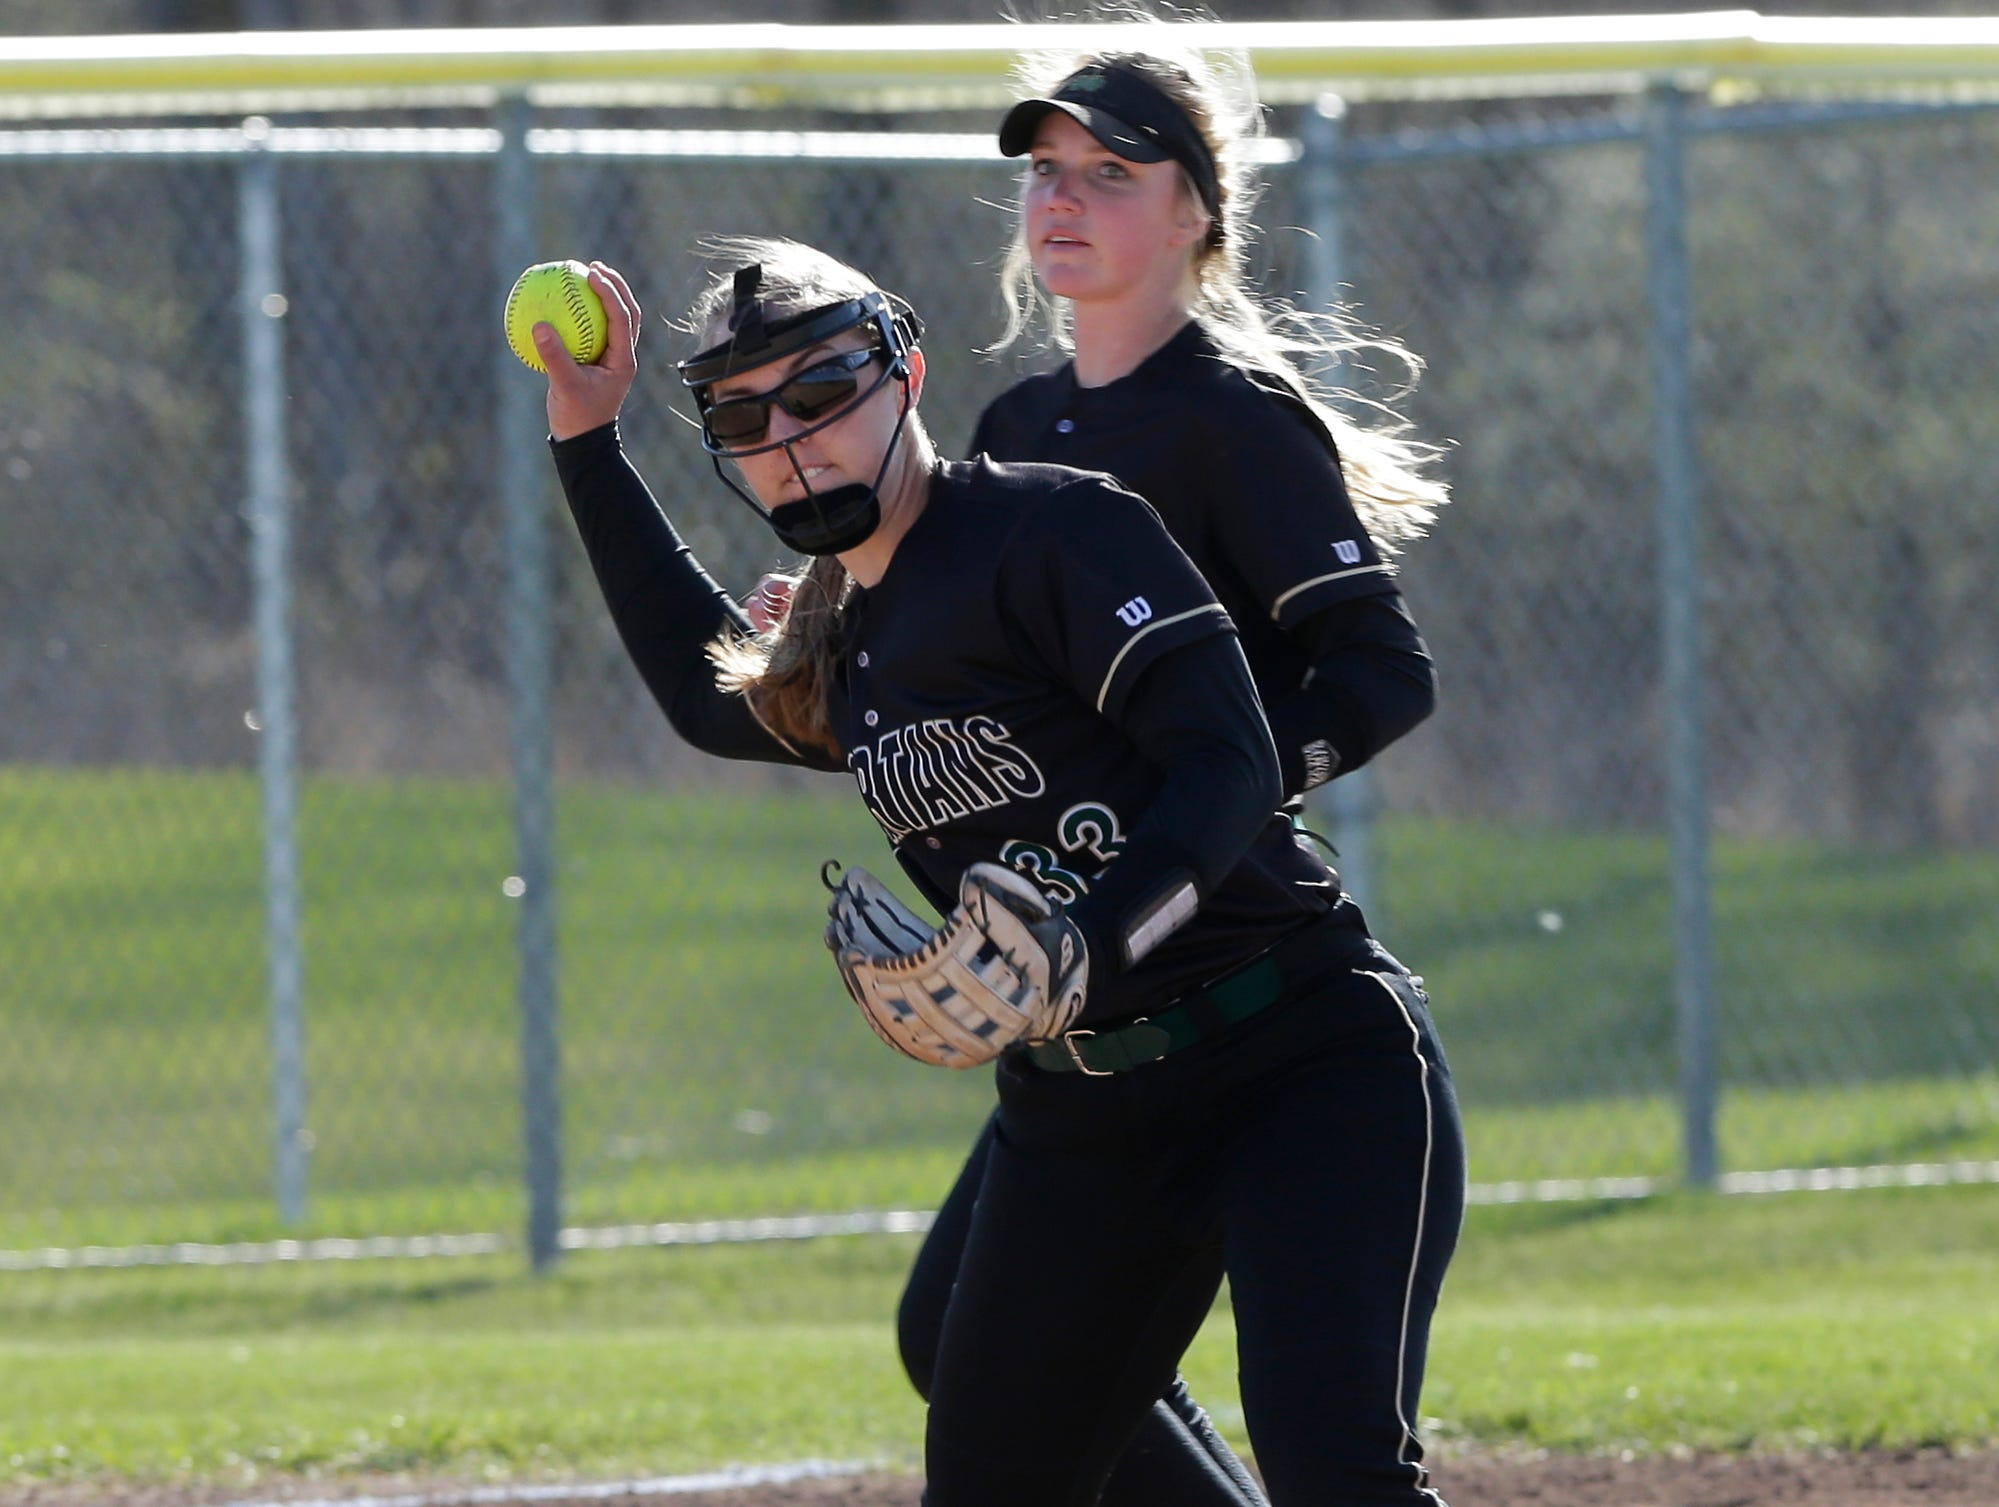 Oshkosh North High School softball's Libby Neveau fields a ball against Fond du Lac High School during their game Friday, April 26, 2019 in Fond du Lac, Wis. Doug Raflik/USA TODAY NETWORK-Wisconsin